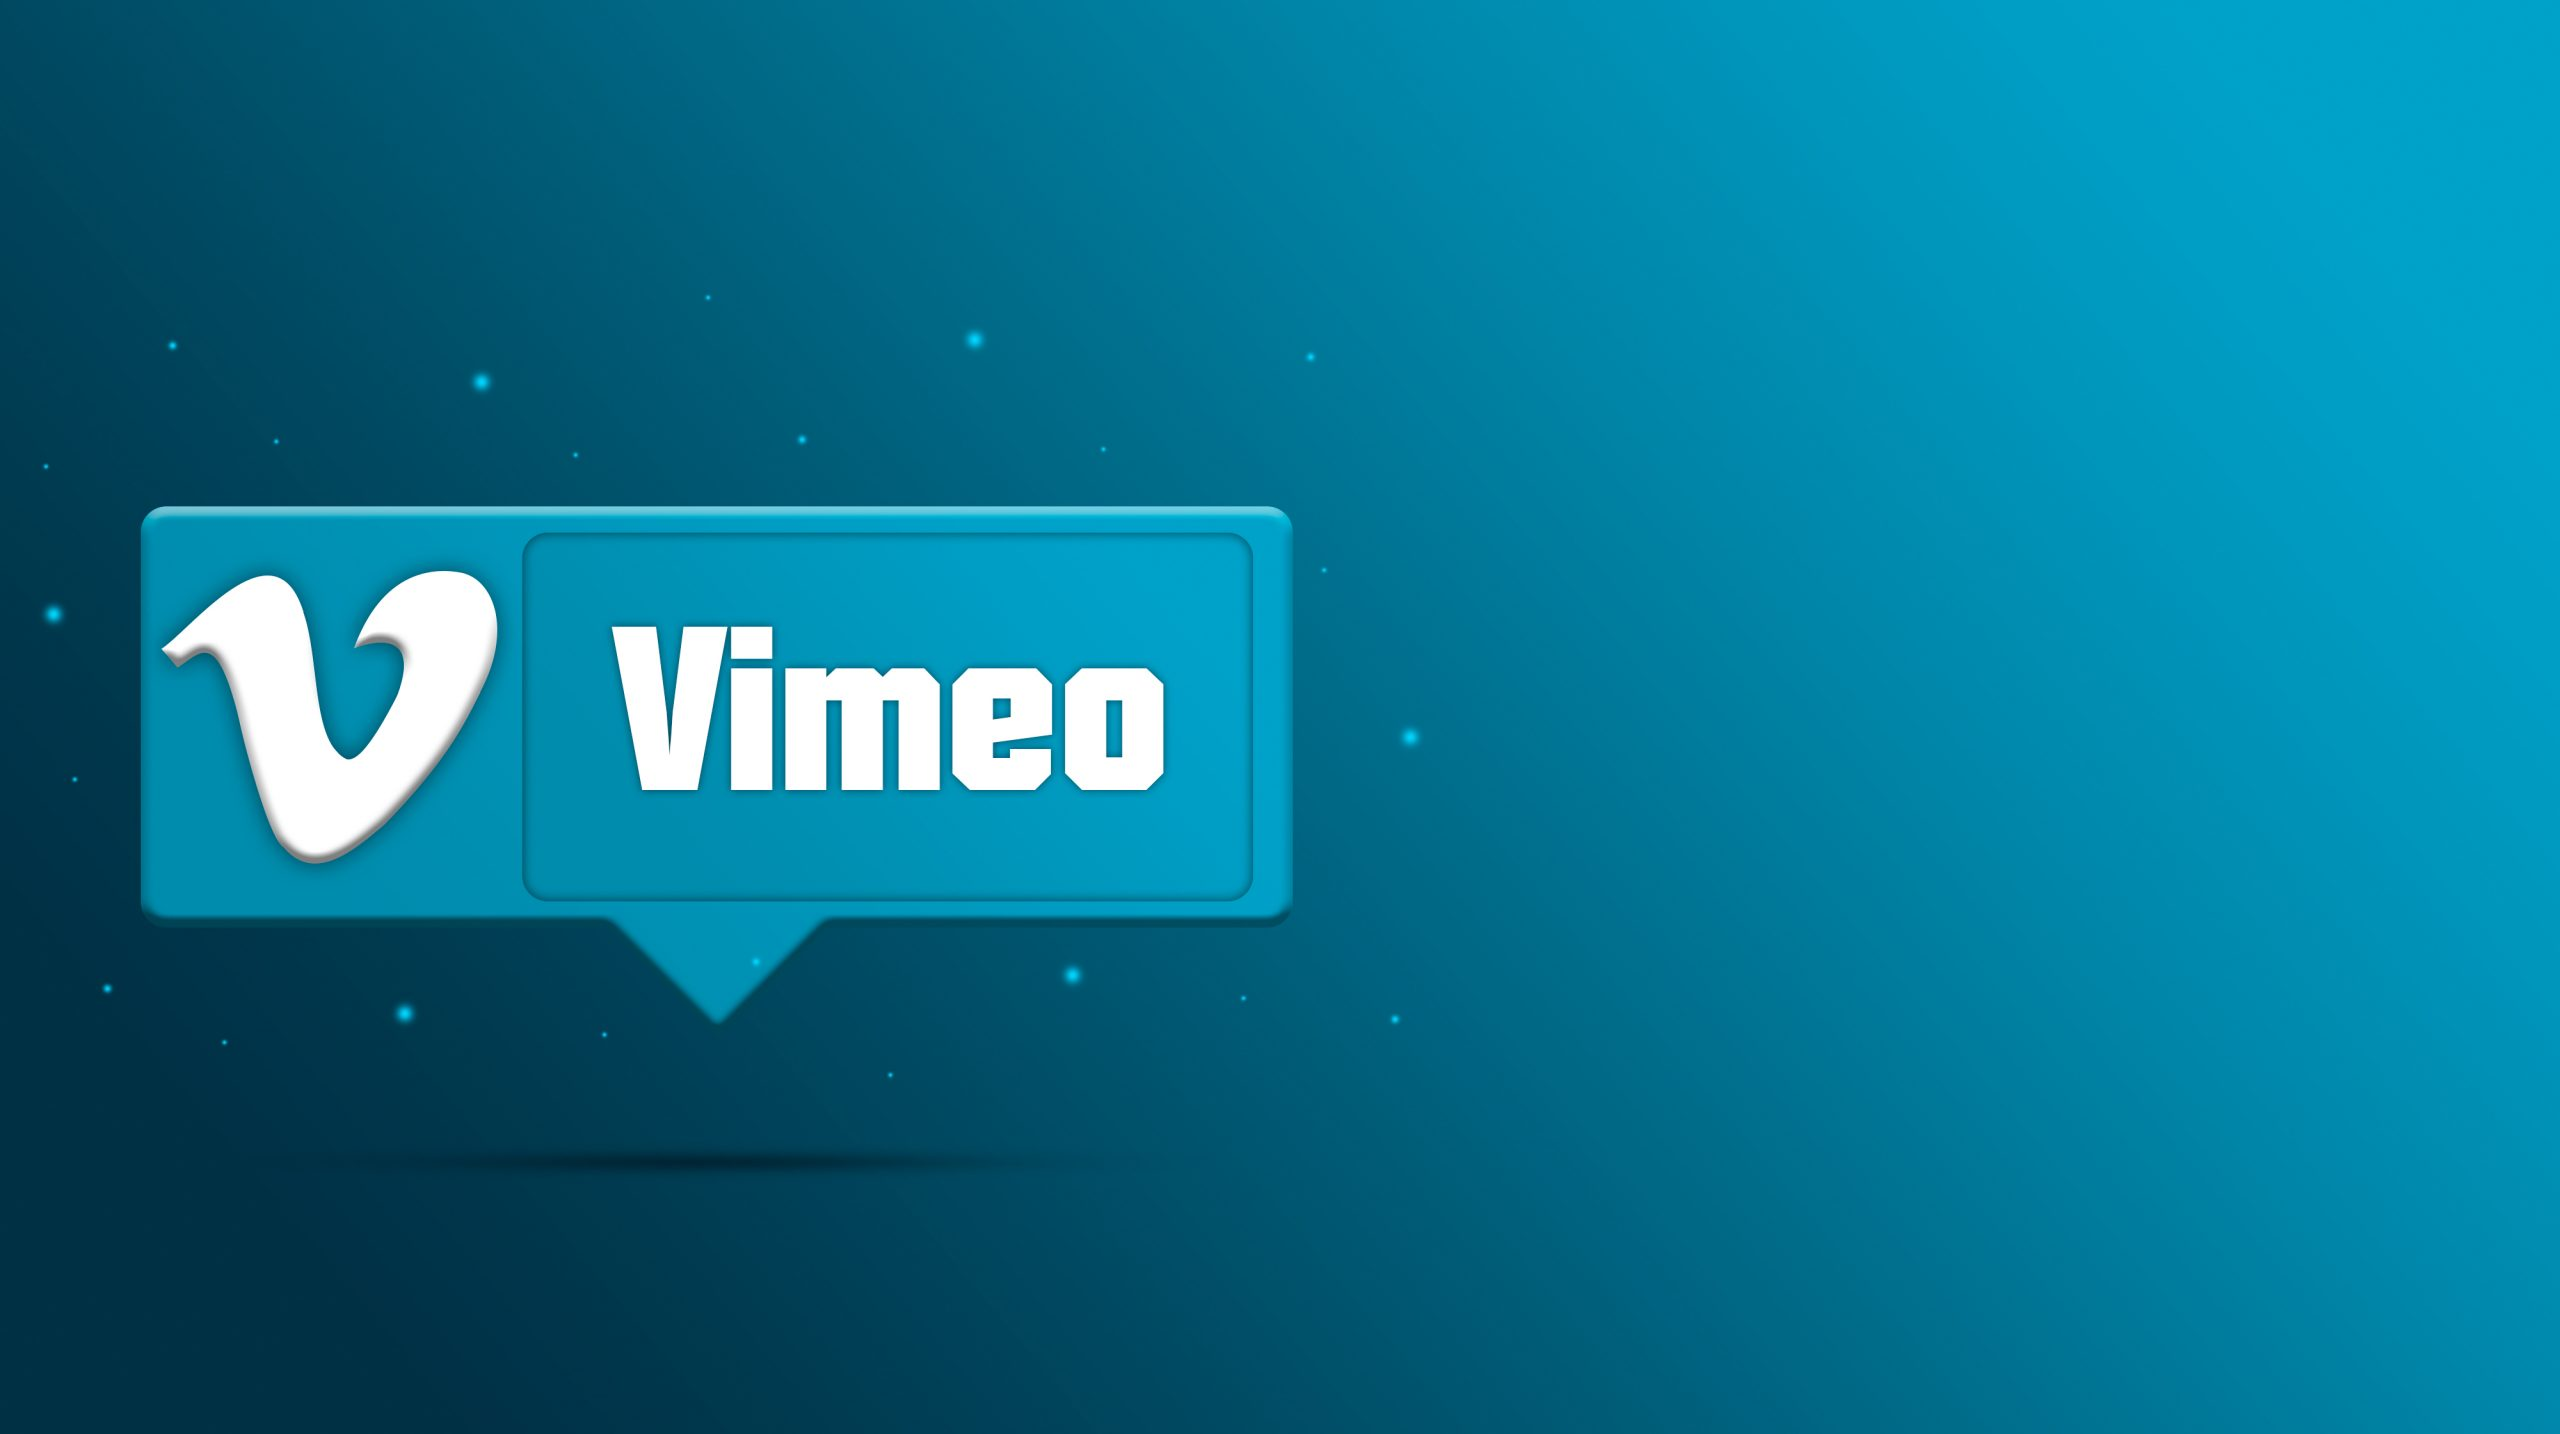 What differentiates and elevates Vimeo